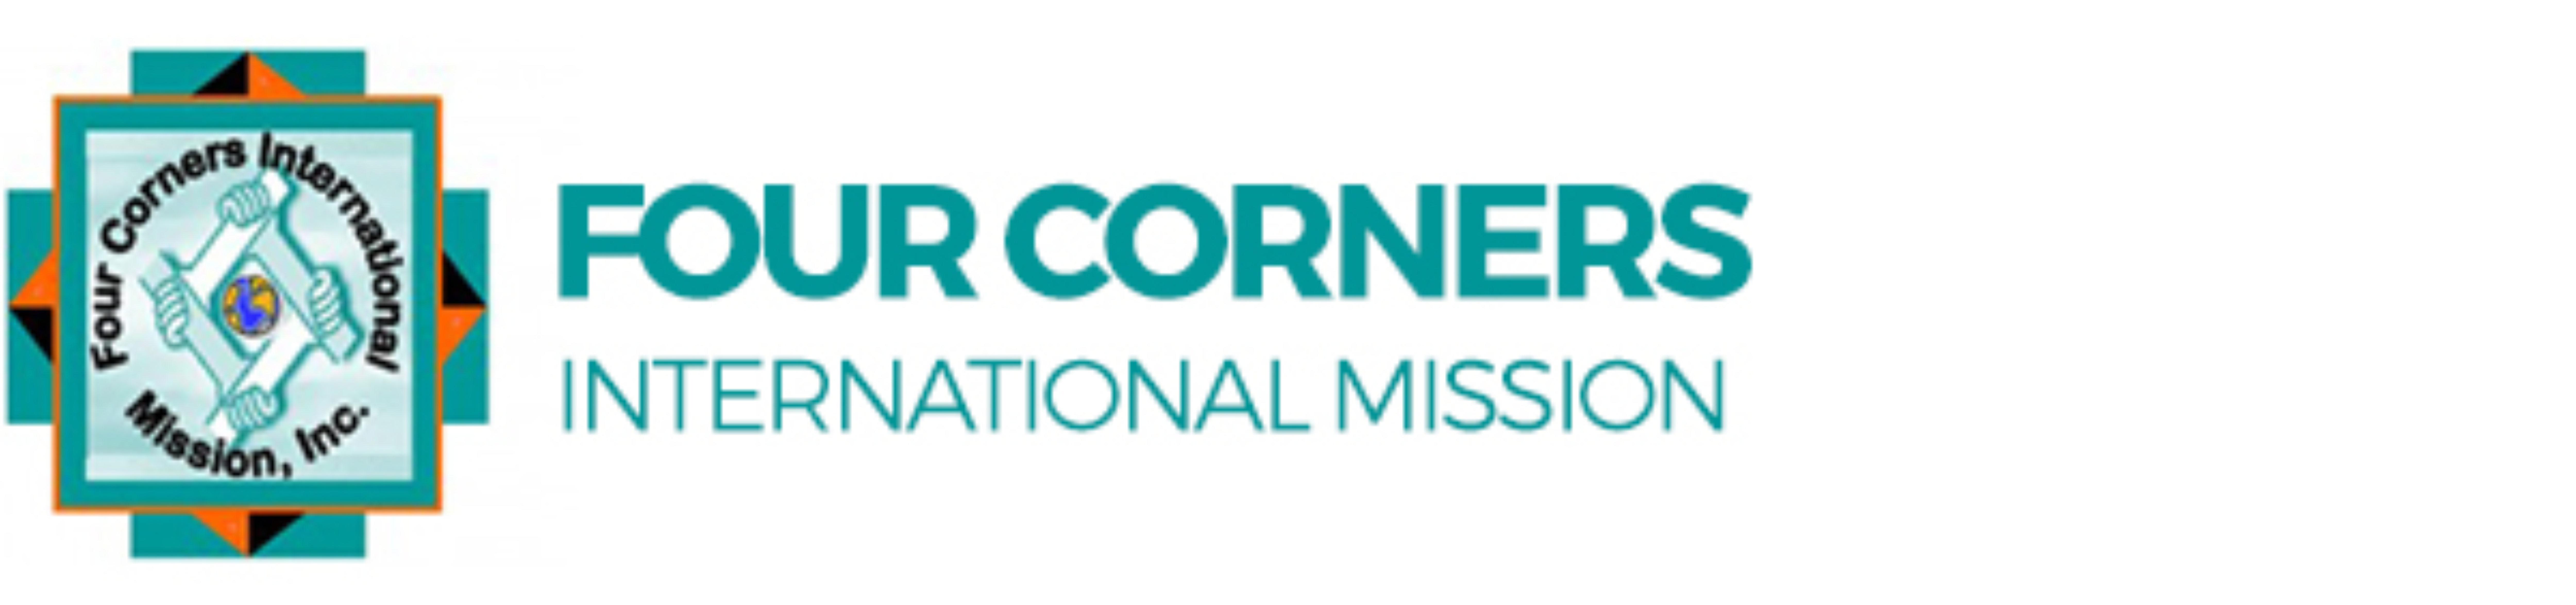 Four Corners International Mission